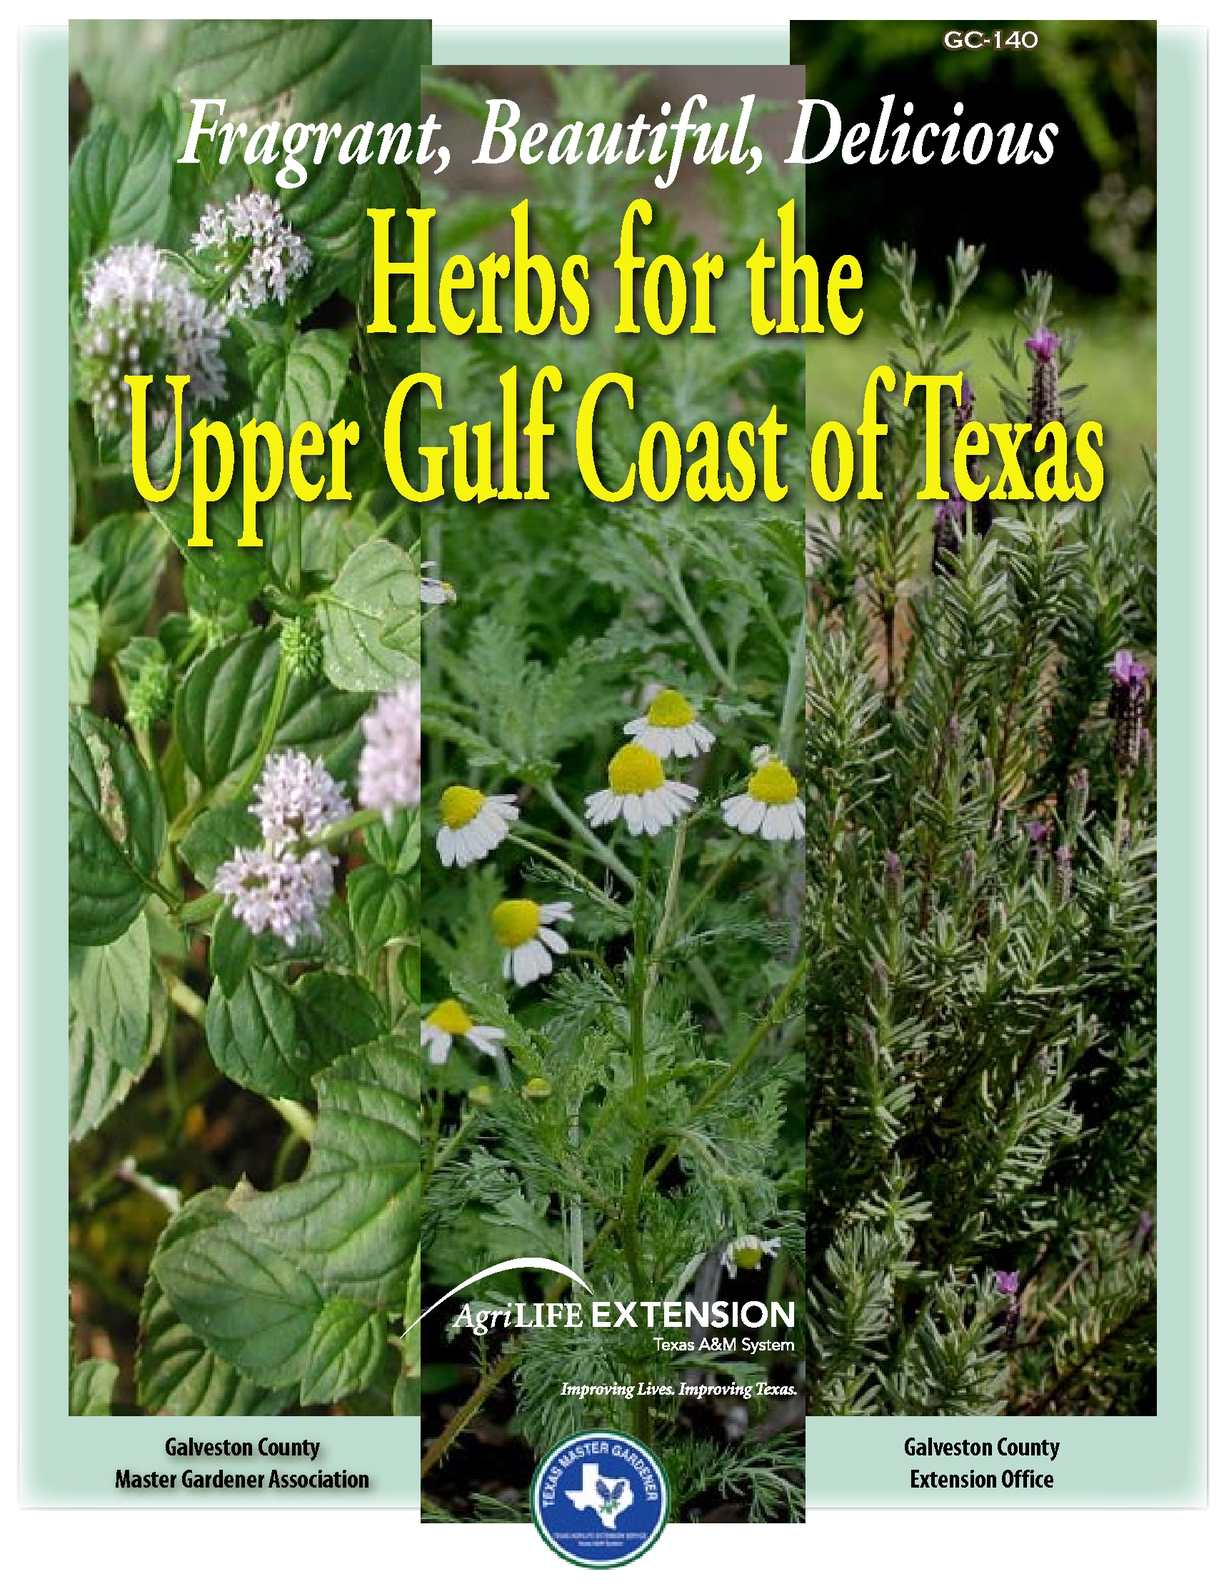 flower arrangement home decor allium rustic arrangement.htm calam  o herbs for the upper gulf coast of texas  herbs for the upper gulf coast of texas